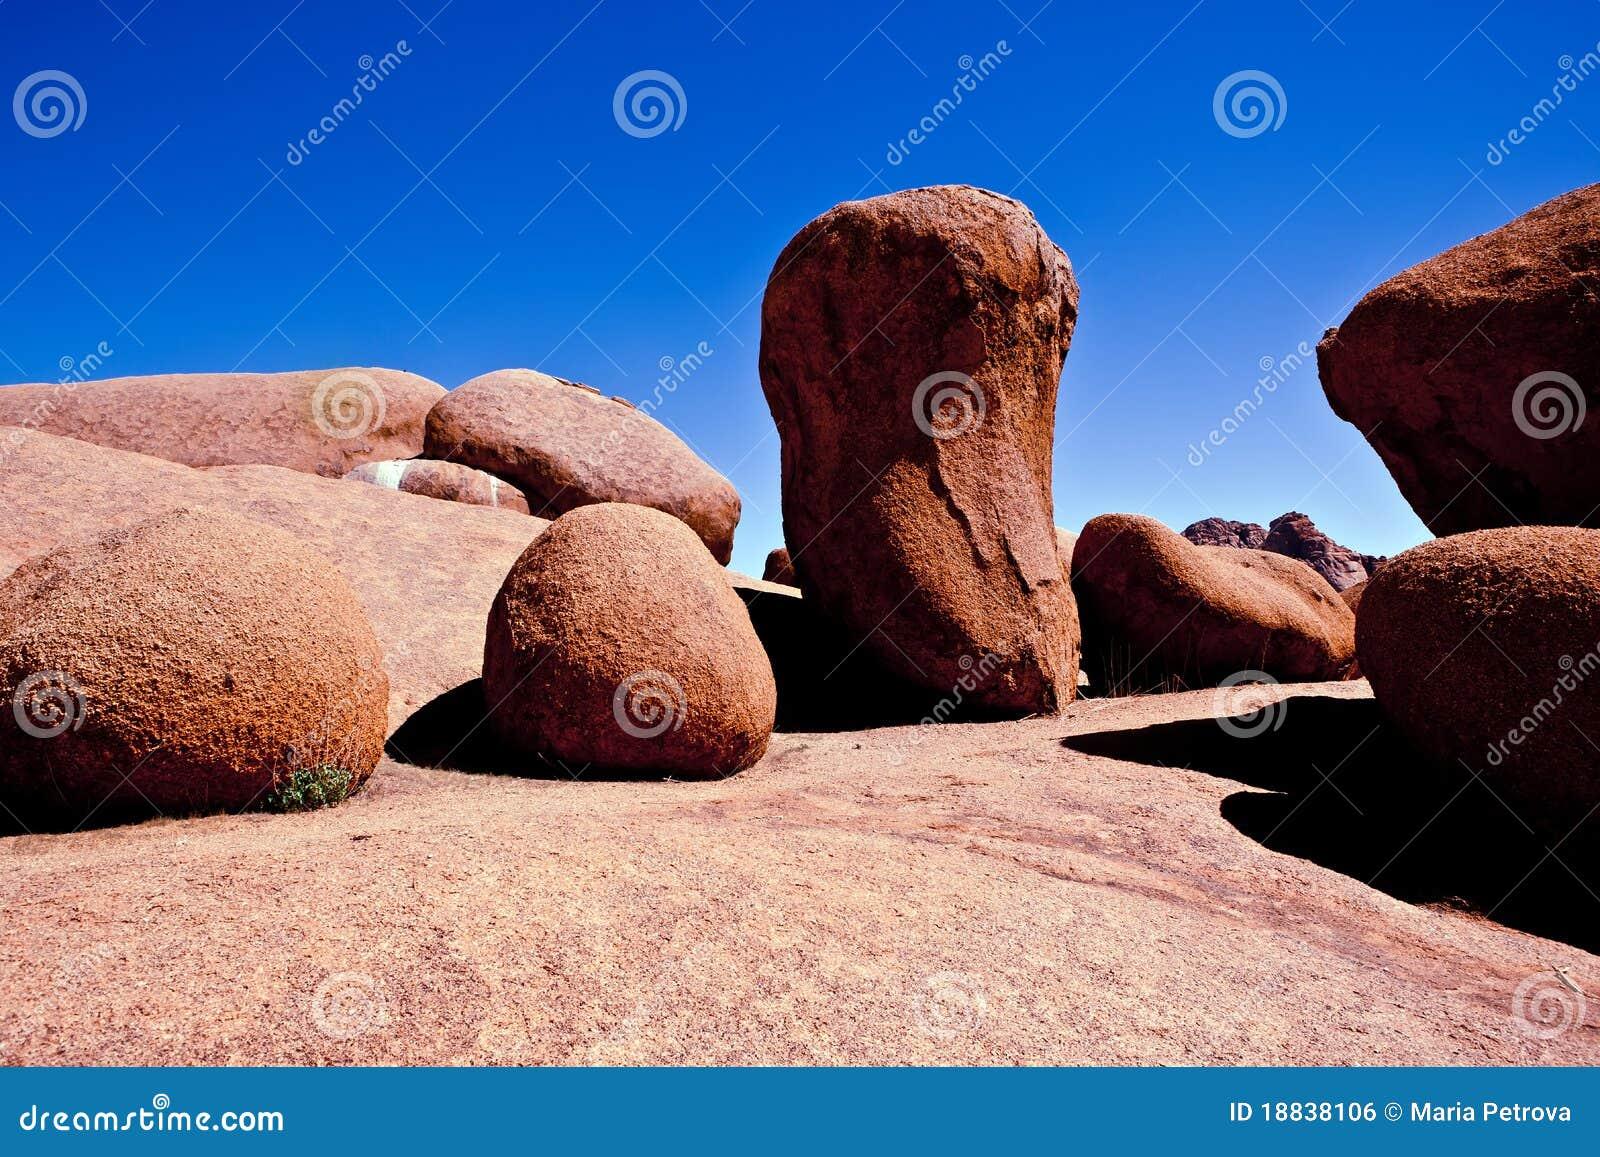 Spitzkoppe för bildandenamibia rock